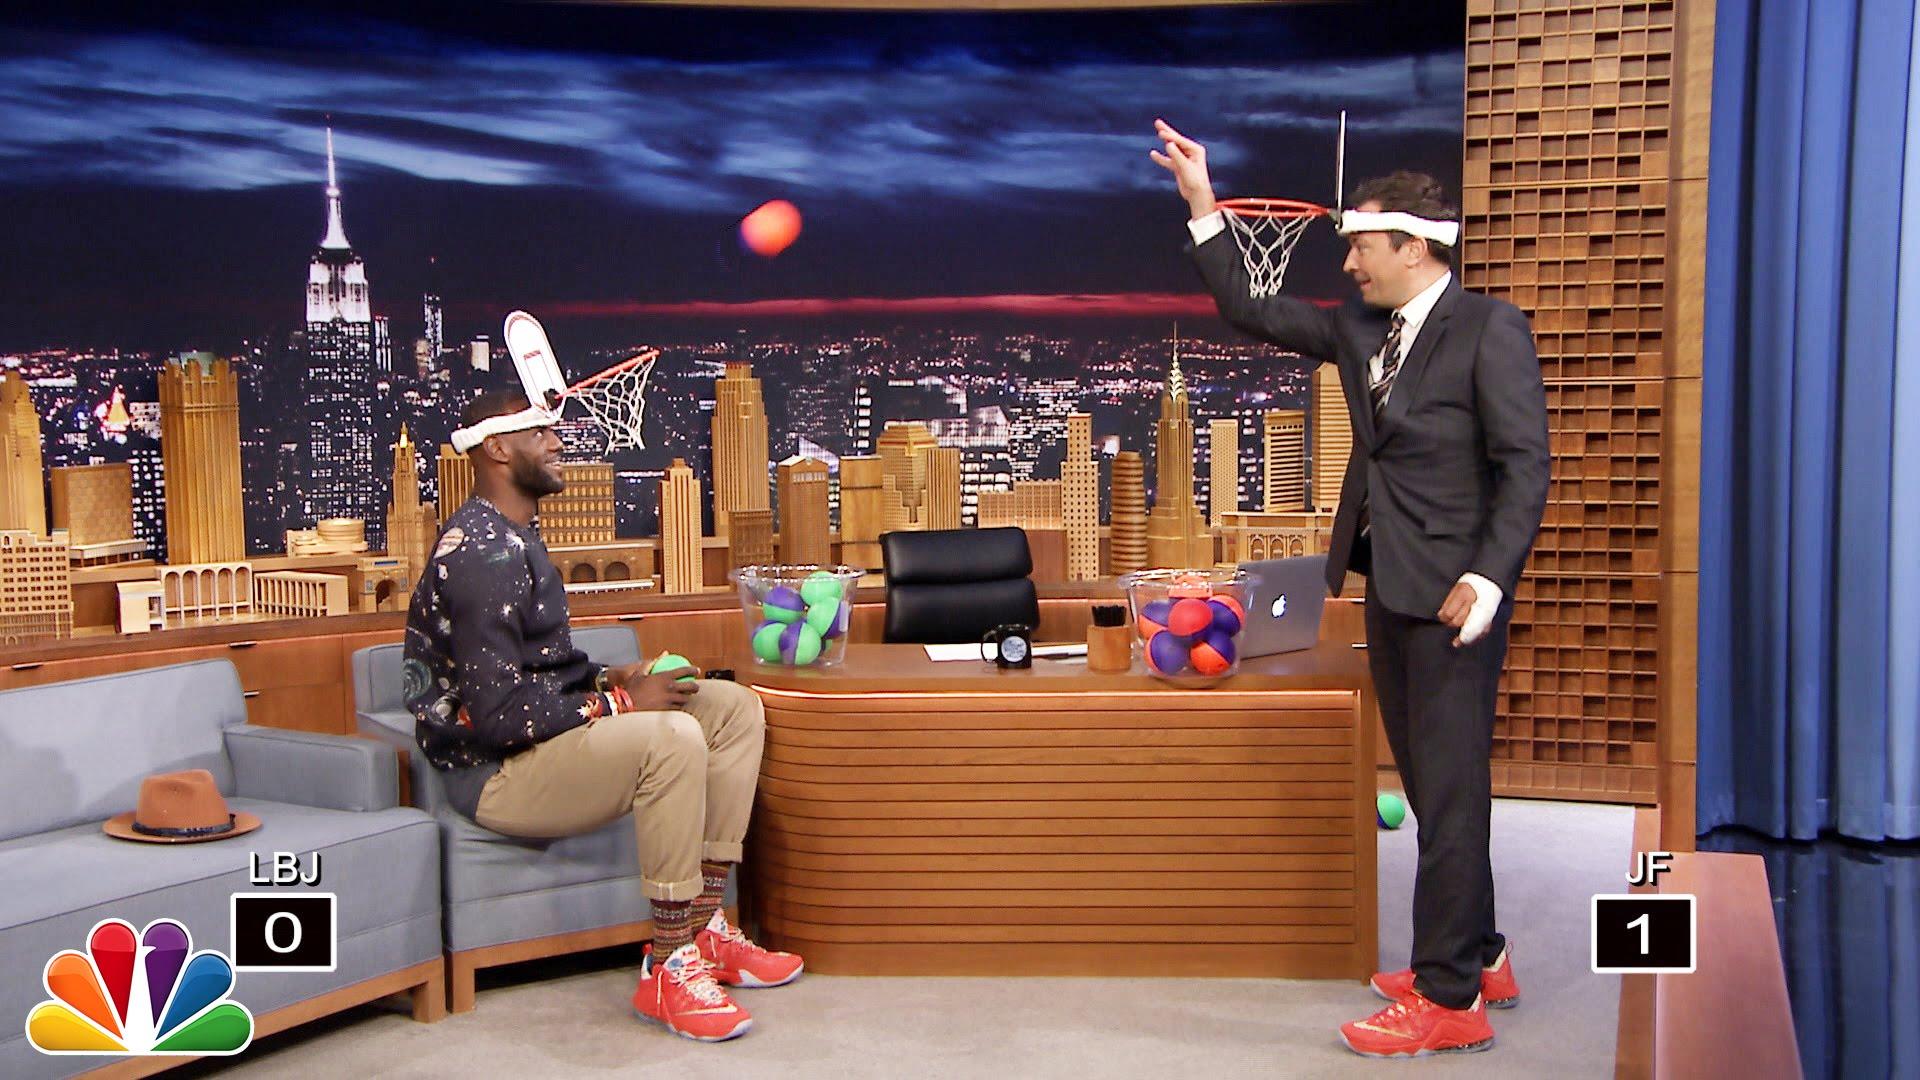 Jimmy Fallon & LeBron James play